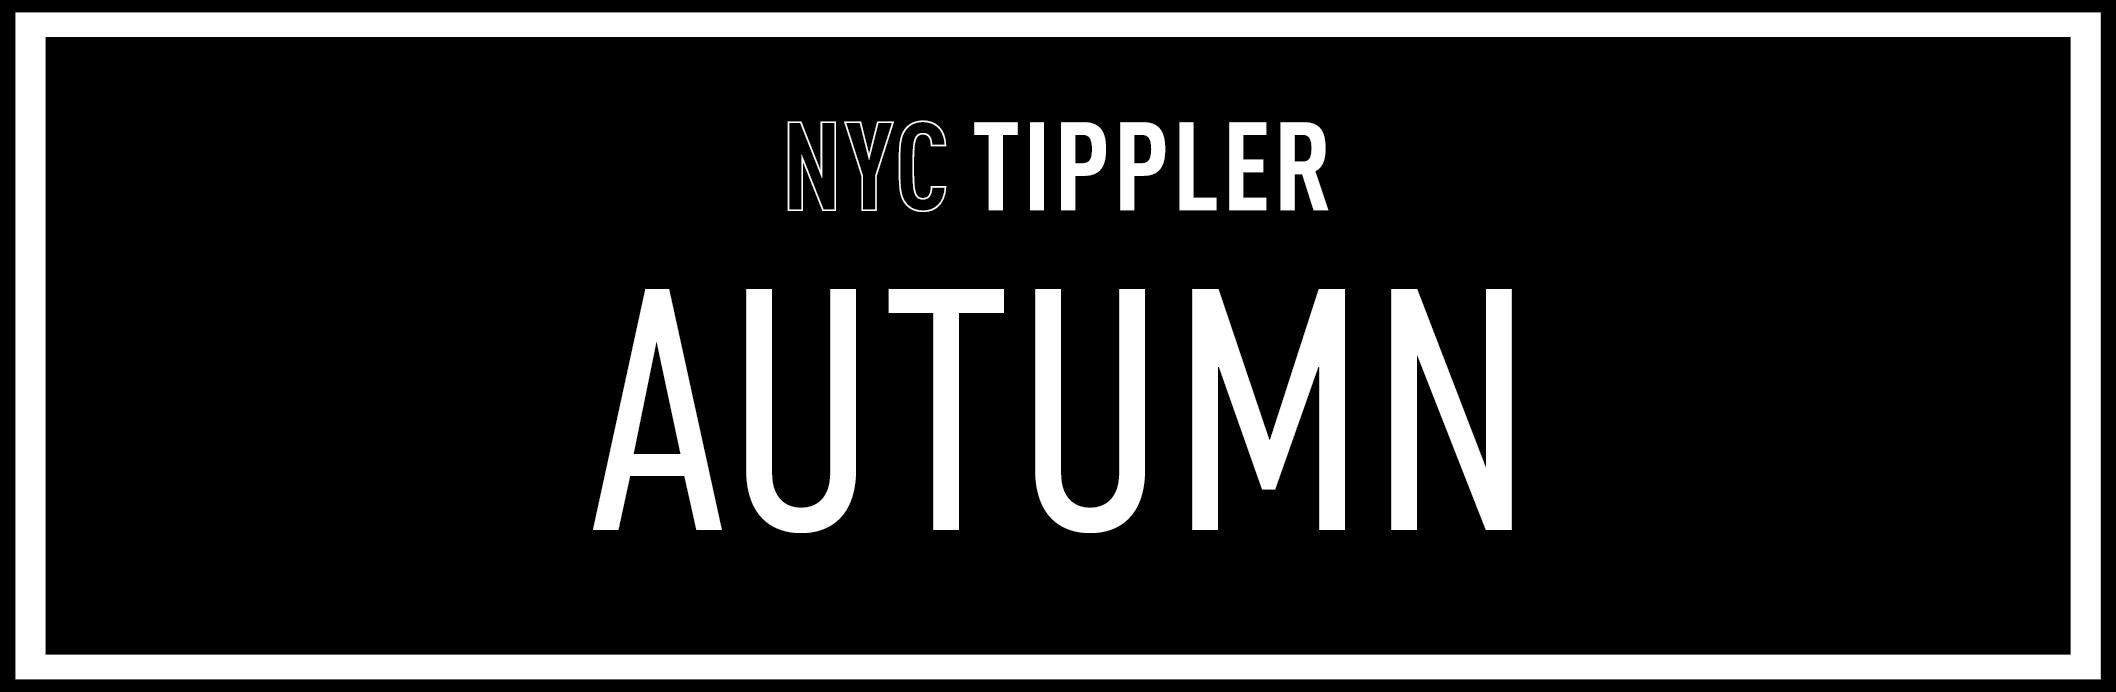 nyc-tippler-logo-seasons-04.png